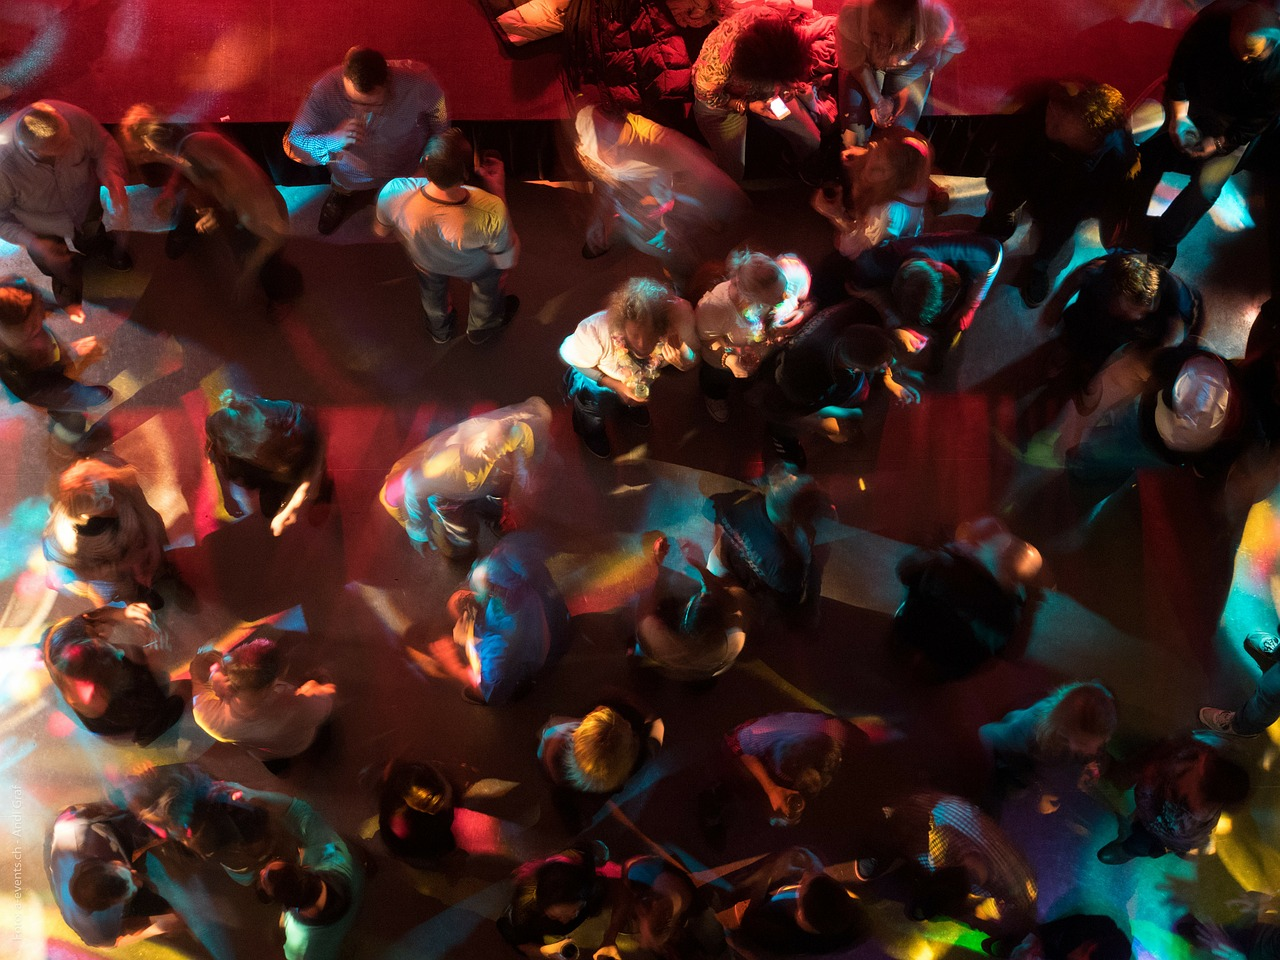 Nightclub fight in downtown Budapest